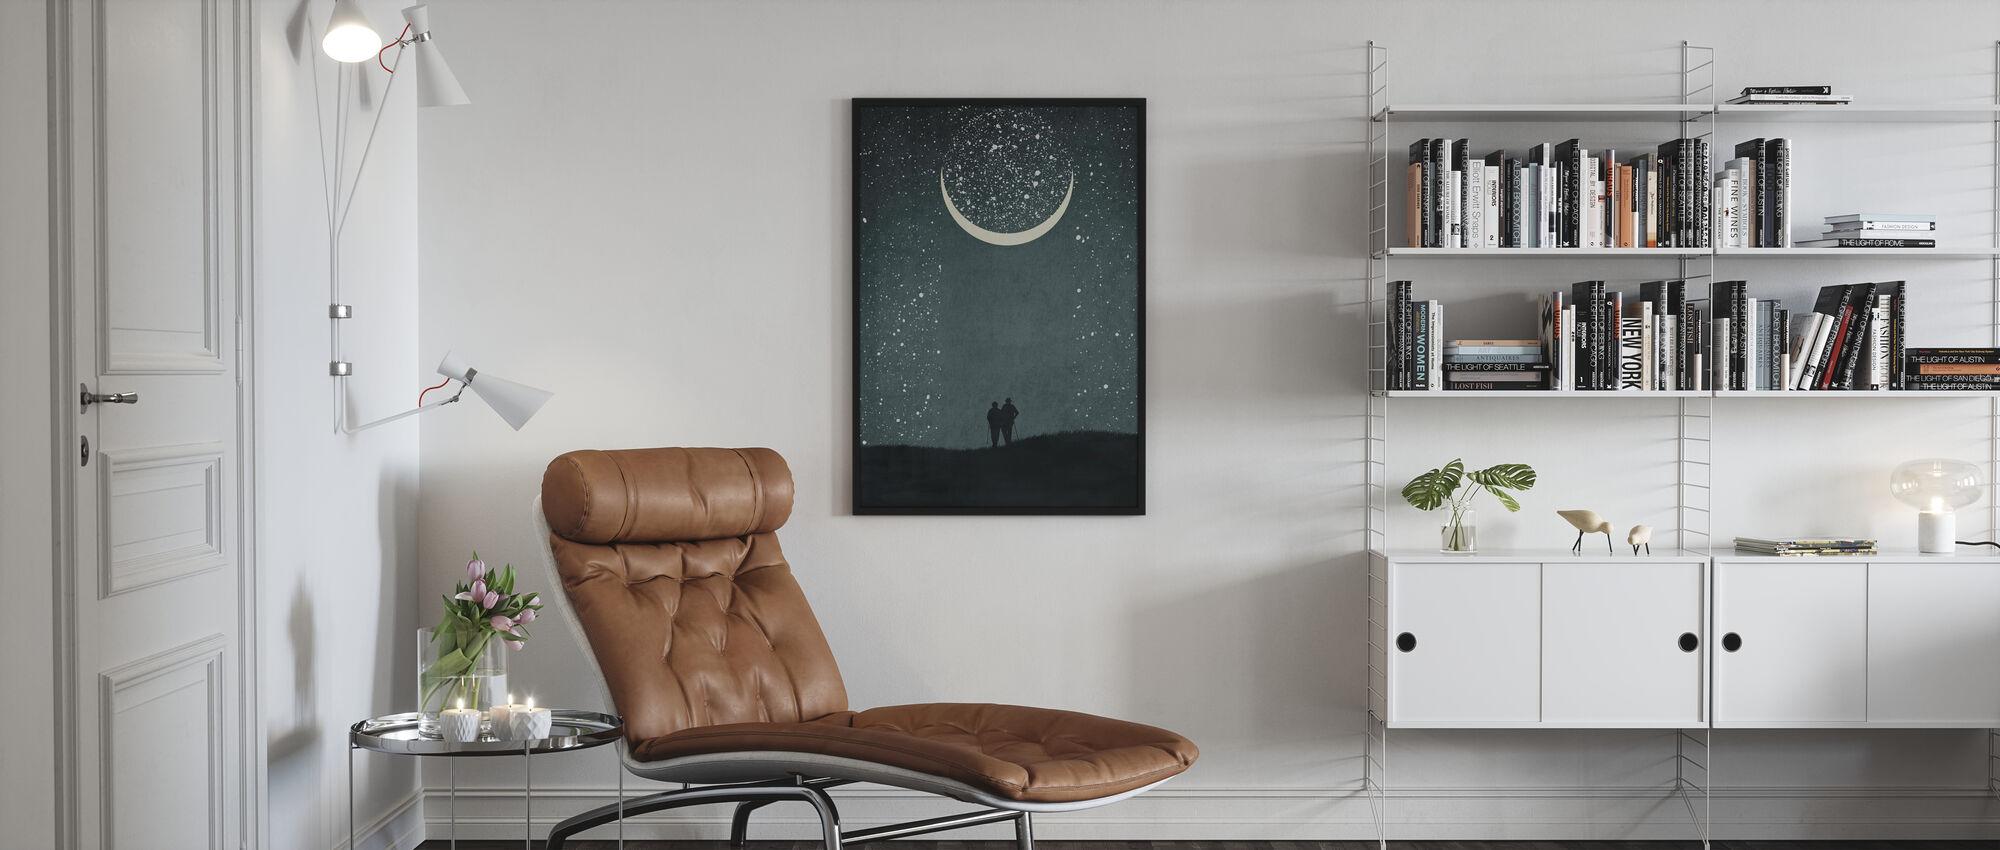 Dromen met jou - Ingelijste print - Woonkamer